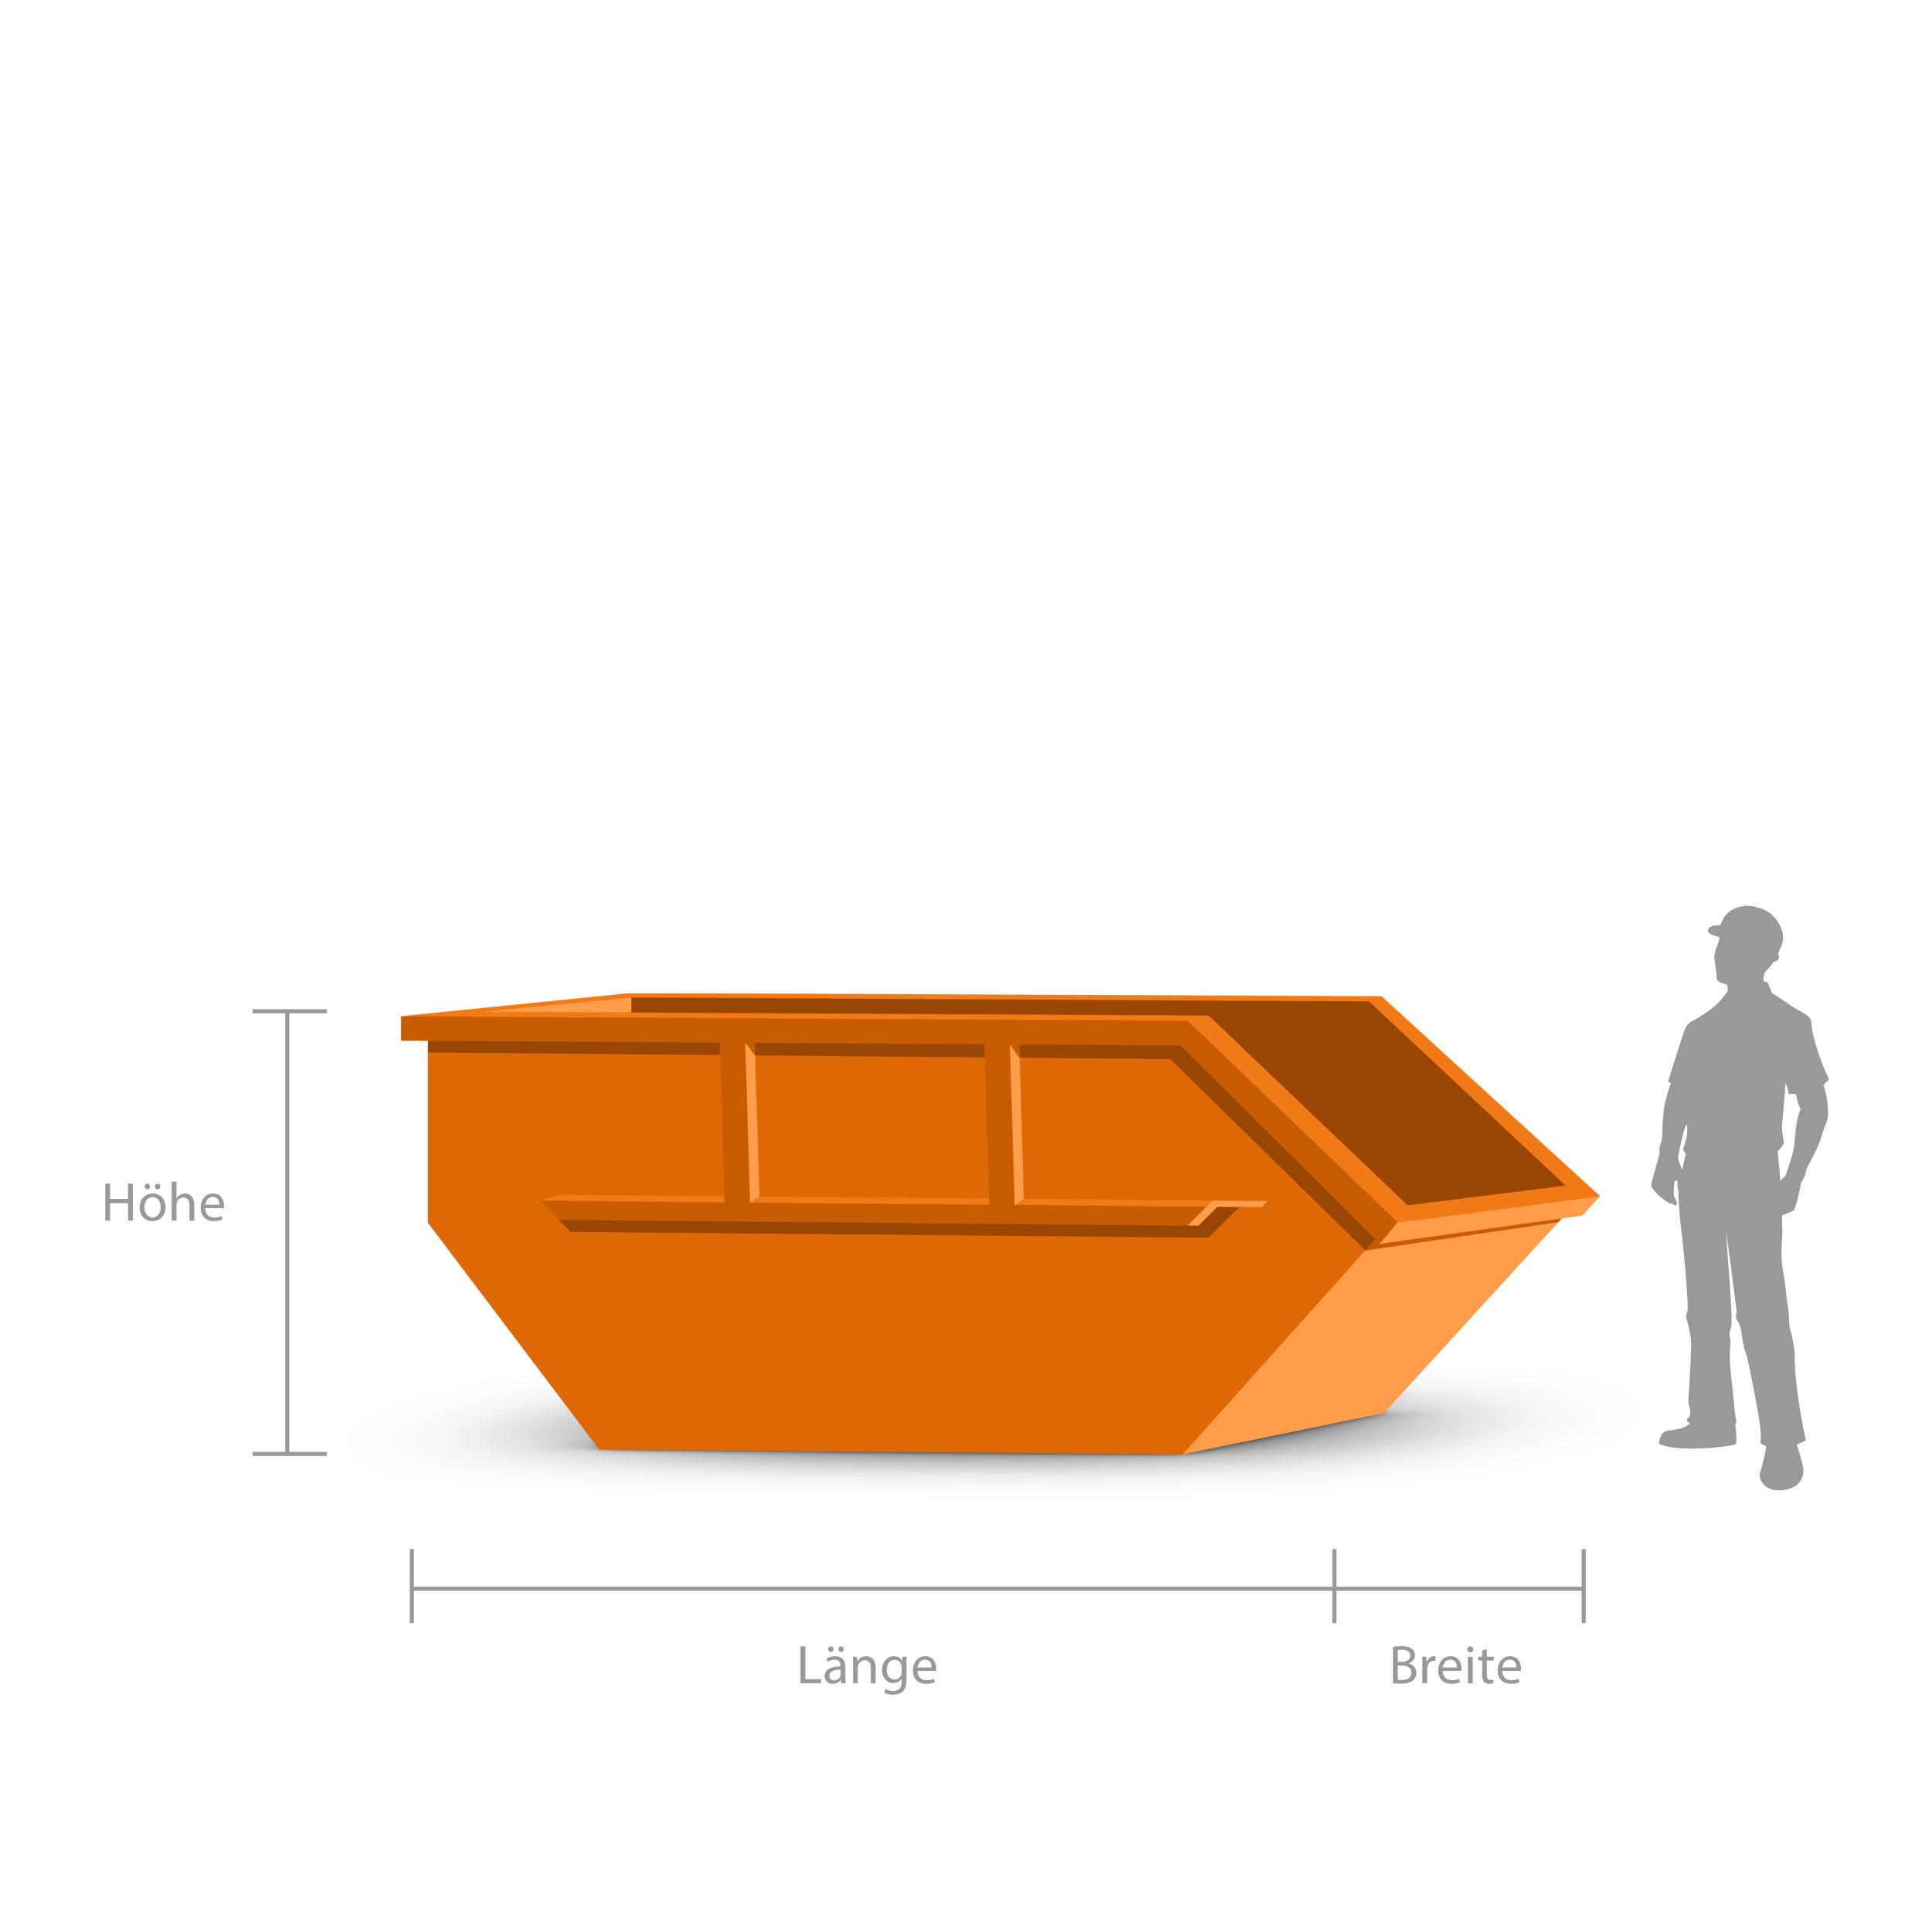 7 cbm container f r gr nabfall online bestellen. Black Bedroom Furniture Sets. Home Design Ideas